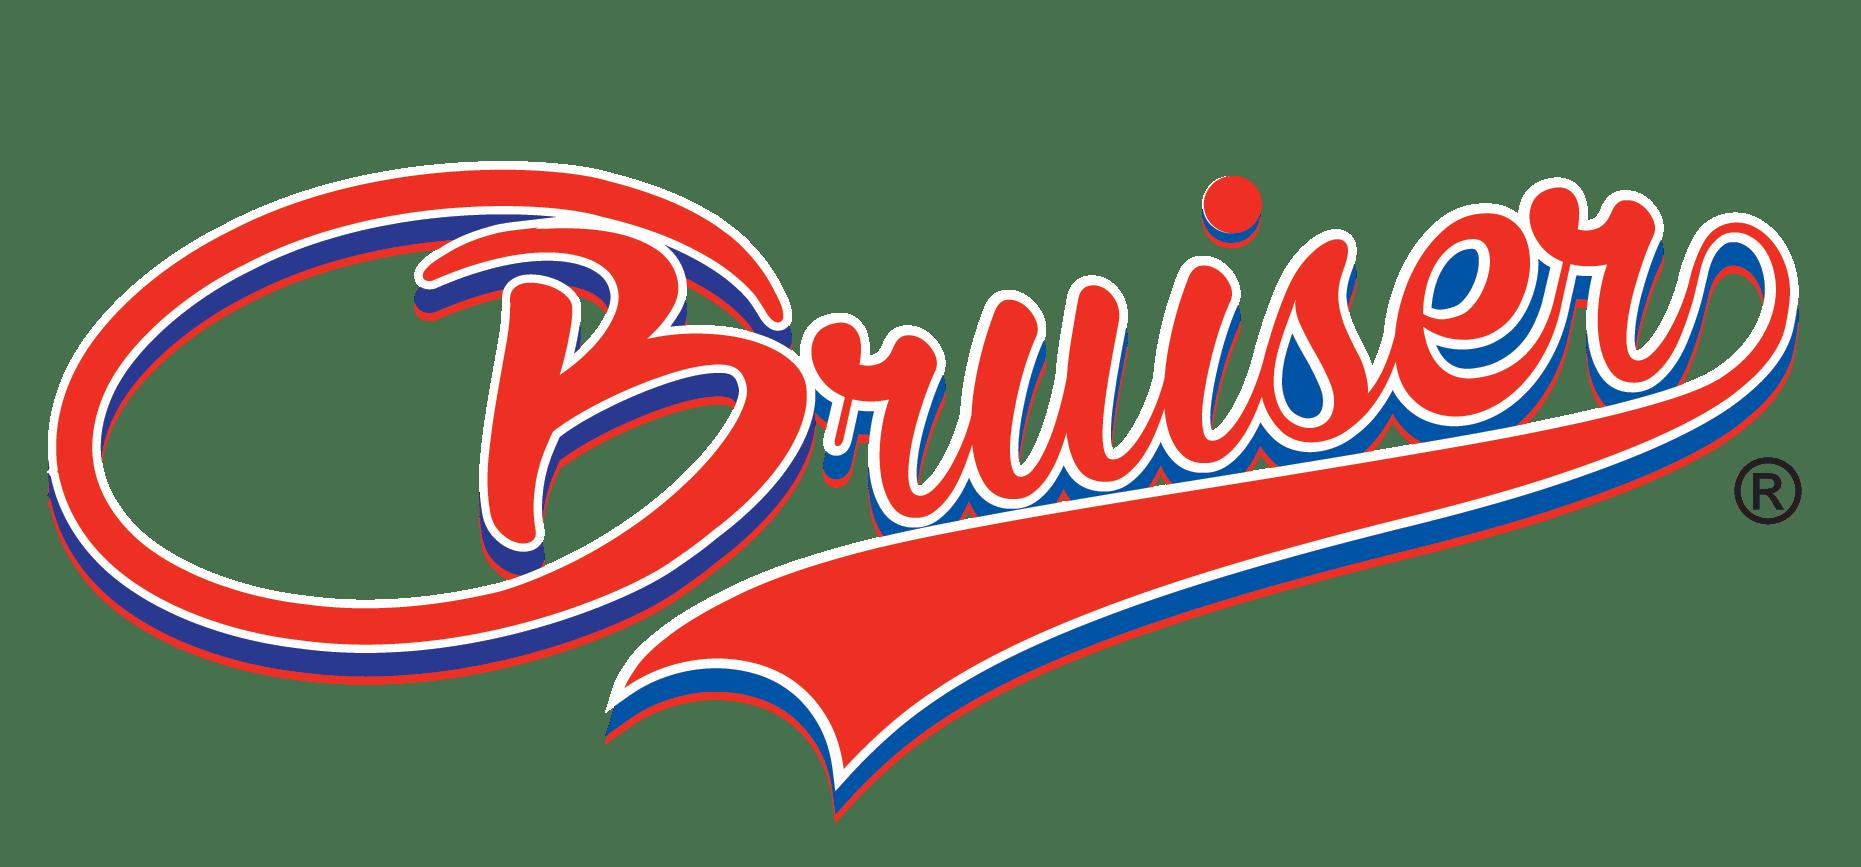 d394dc19b Bruiser Sports - Shoulder pad para Futebol Americano